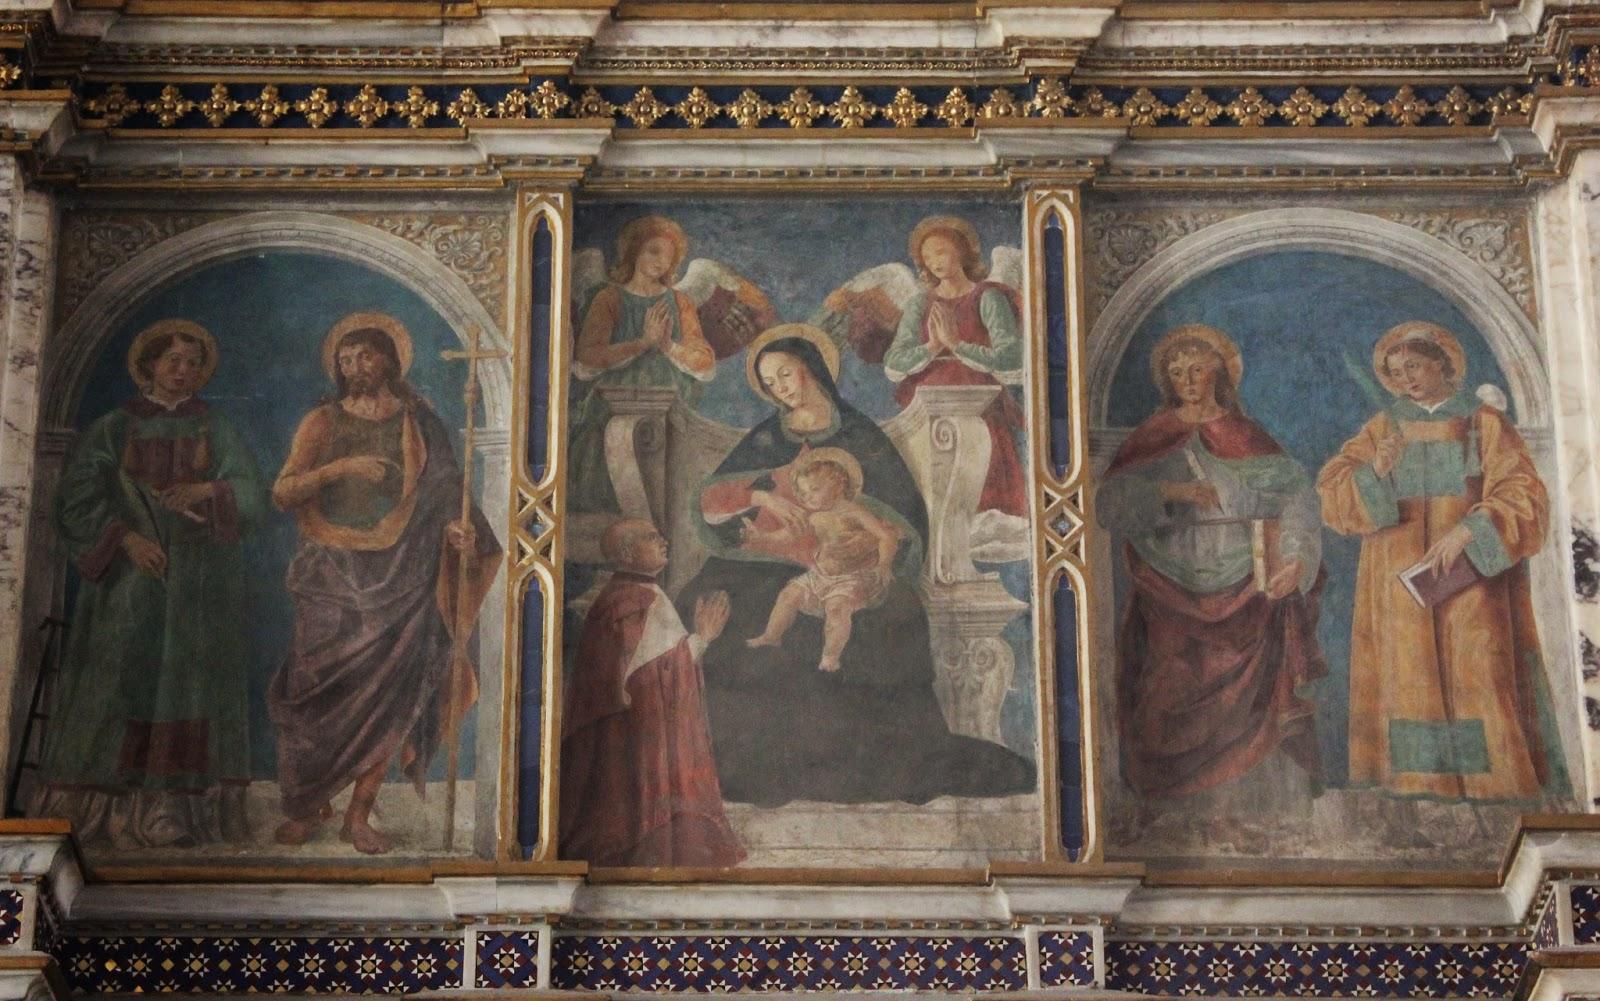 1475-99 Antoniazzo Romano St. Laurent, Jean Baptiste, Evang, Etienne,fresques du ciborium de Basilica di S. Giovanni in Laterano,